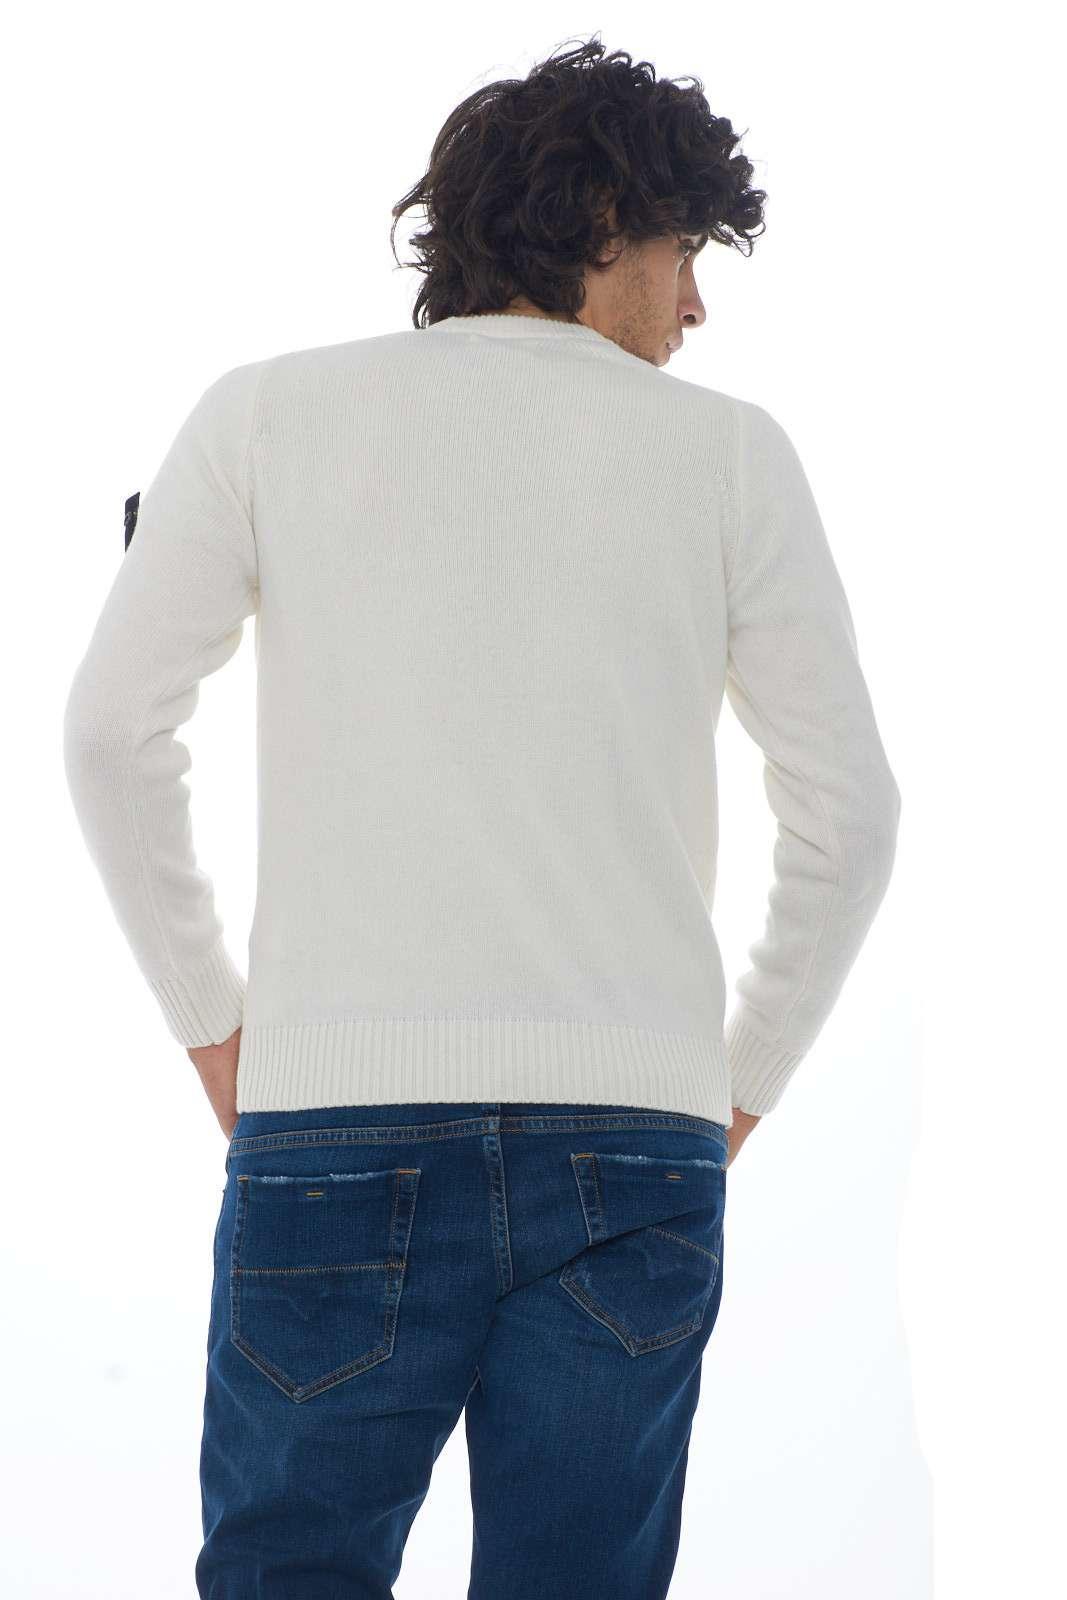 https://www.parmax.com/media/catalog/product/a/i/AI-outlet_parmax-maglia-uomo-Stone-Island-7115552A3-C.jpg